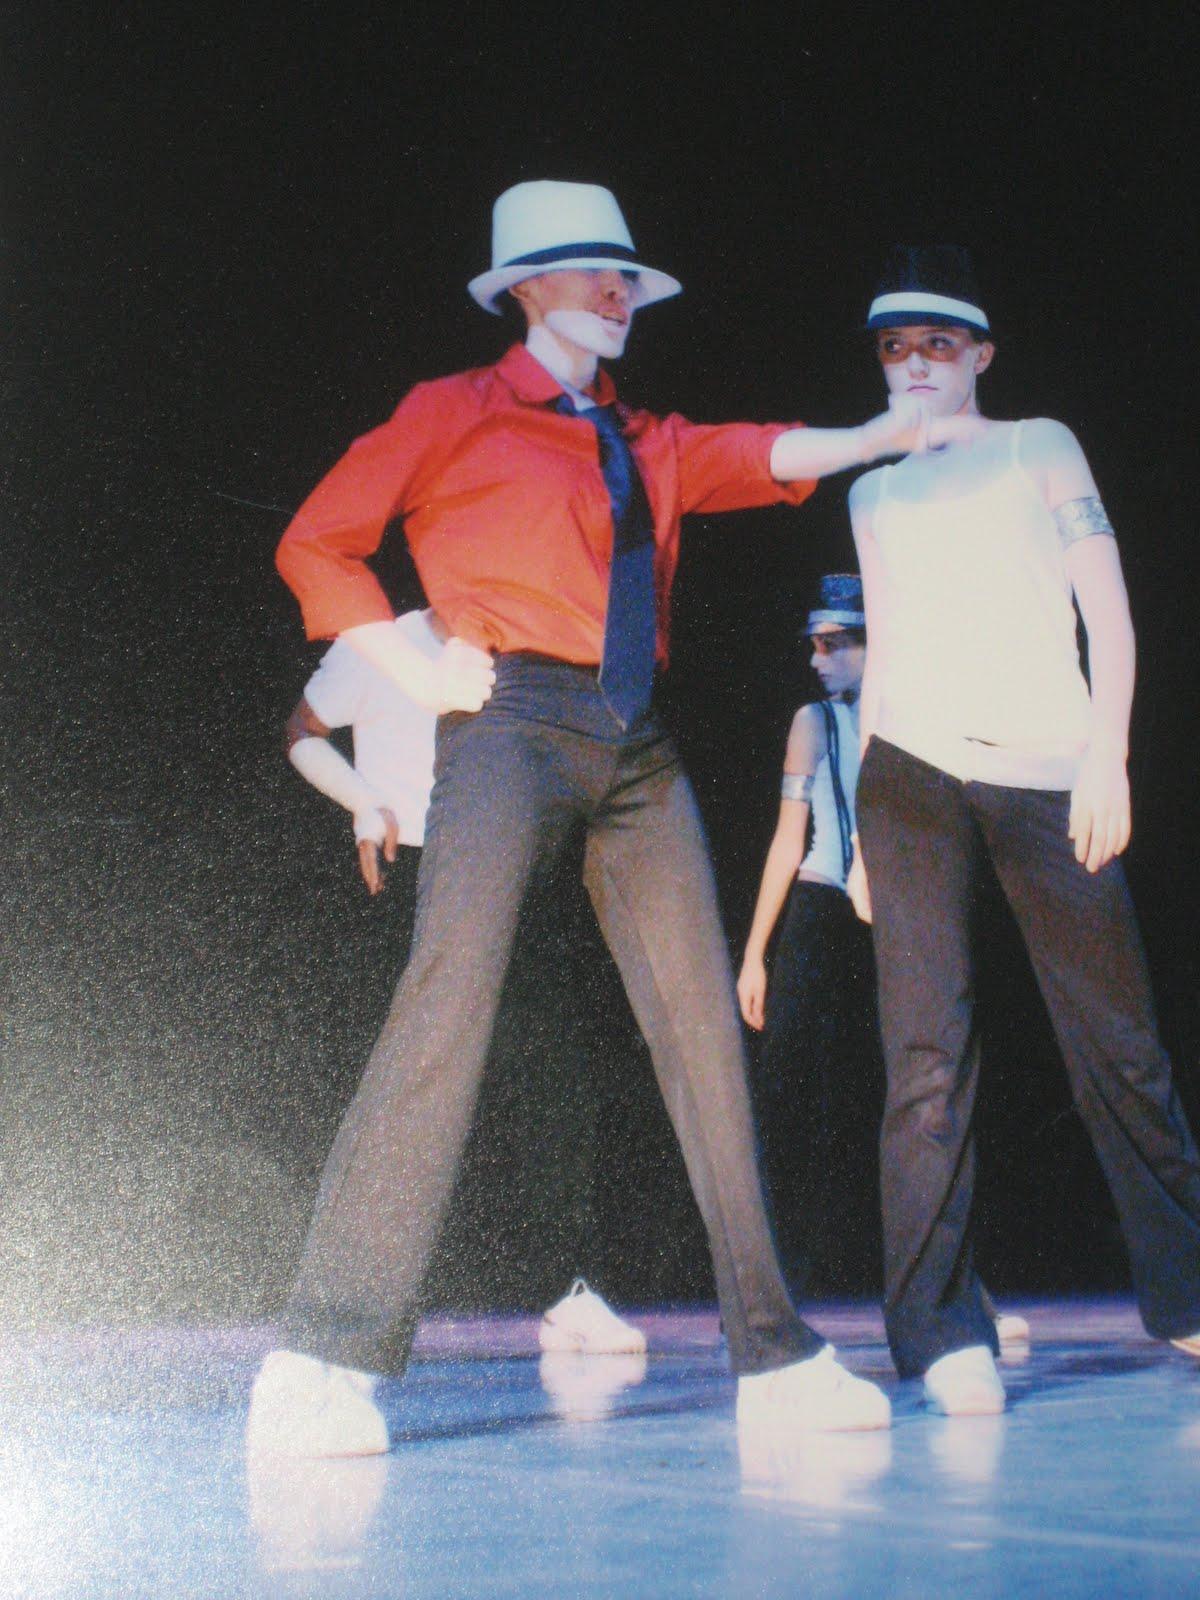 http://2.bp.blogspot.com/_edCjm5I2cKI/Sw_vxI64VgI/AAAAAAAAABA/3DcUeU08s54/s1600/Michael+Jackson+dance+2.JPG